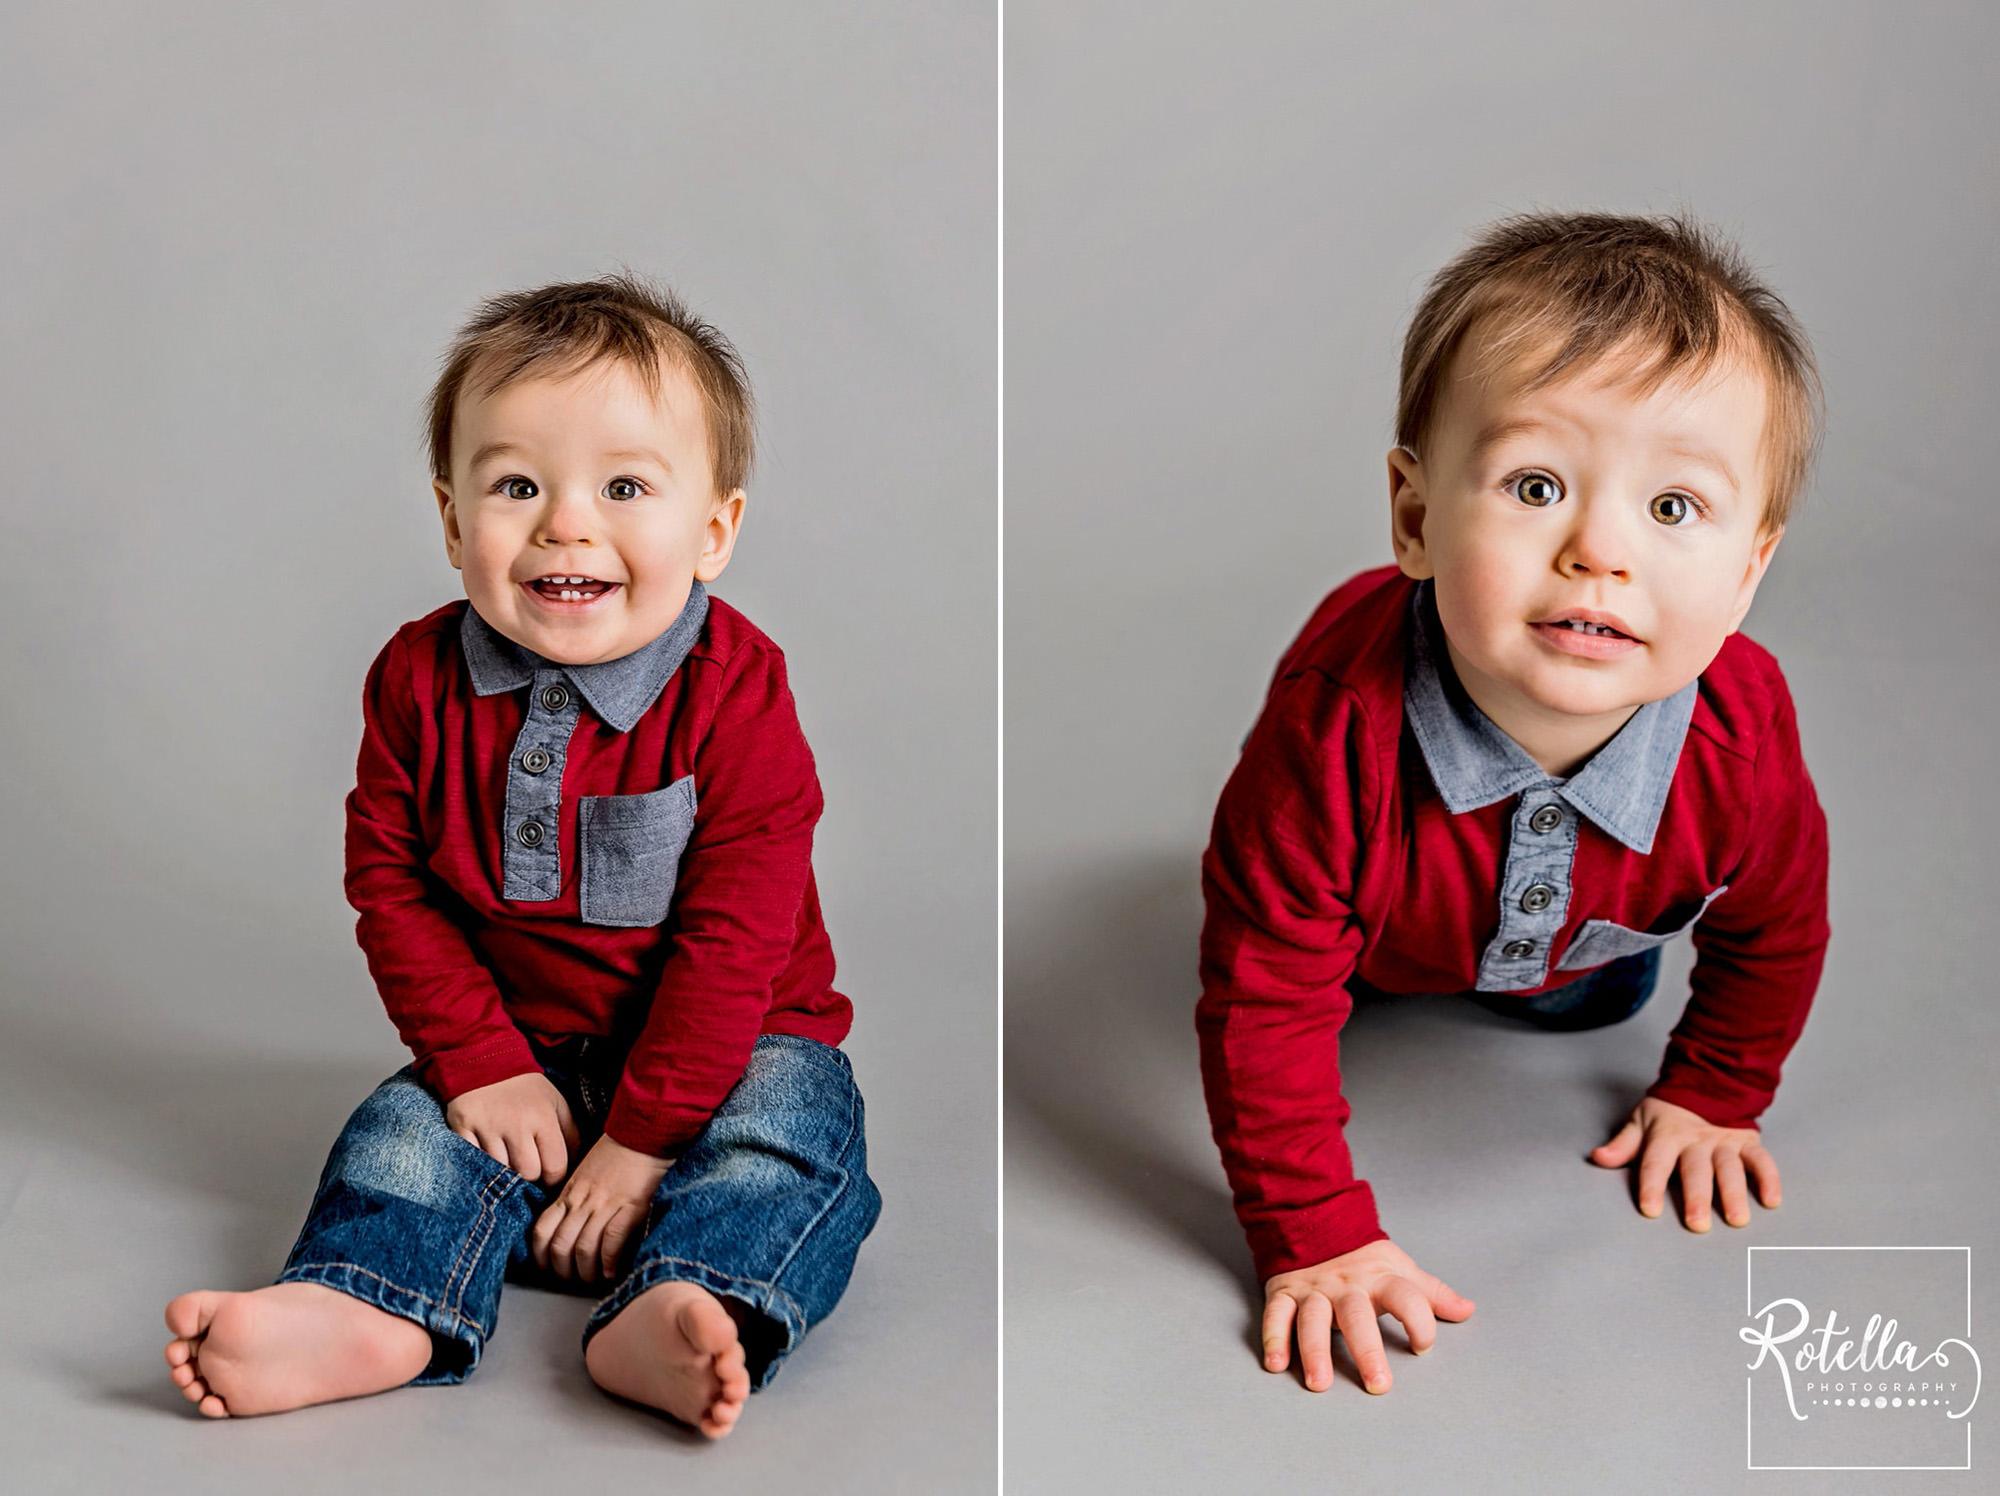 Rotella Photography - baby sitting on grey backdrop